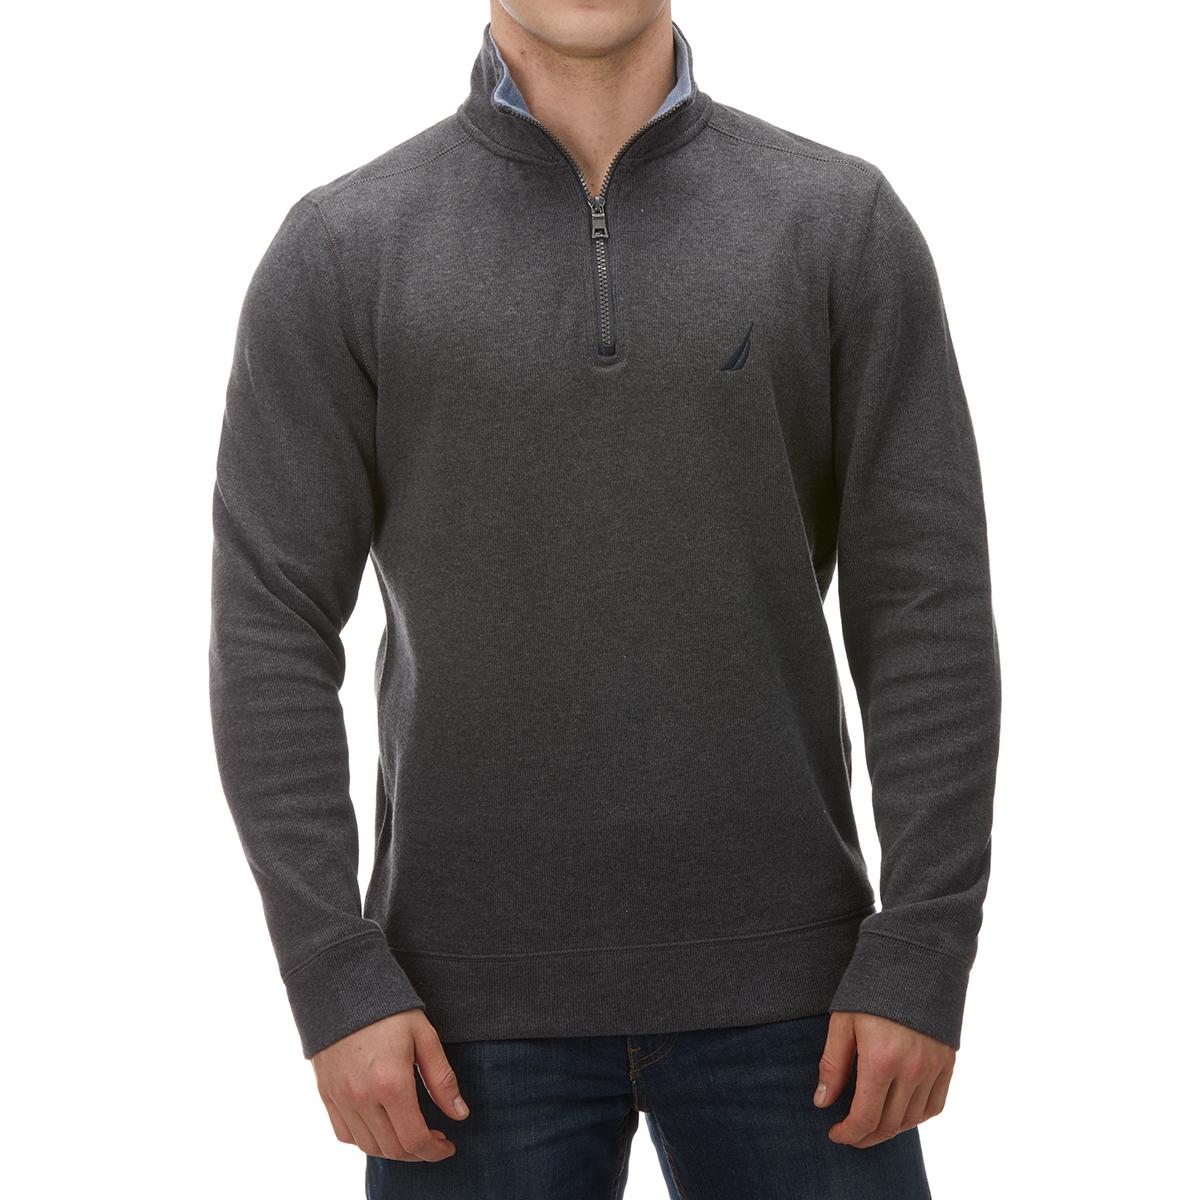 Nautica Men's Classic Fit Quarter Zip Pullover Fleece - Black, L